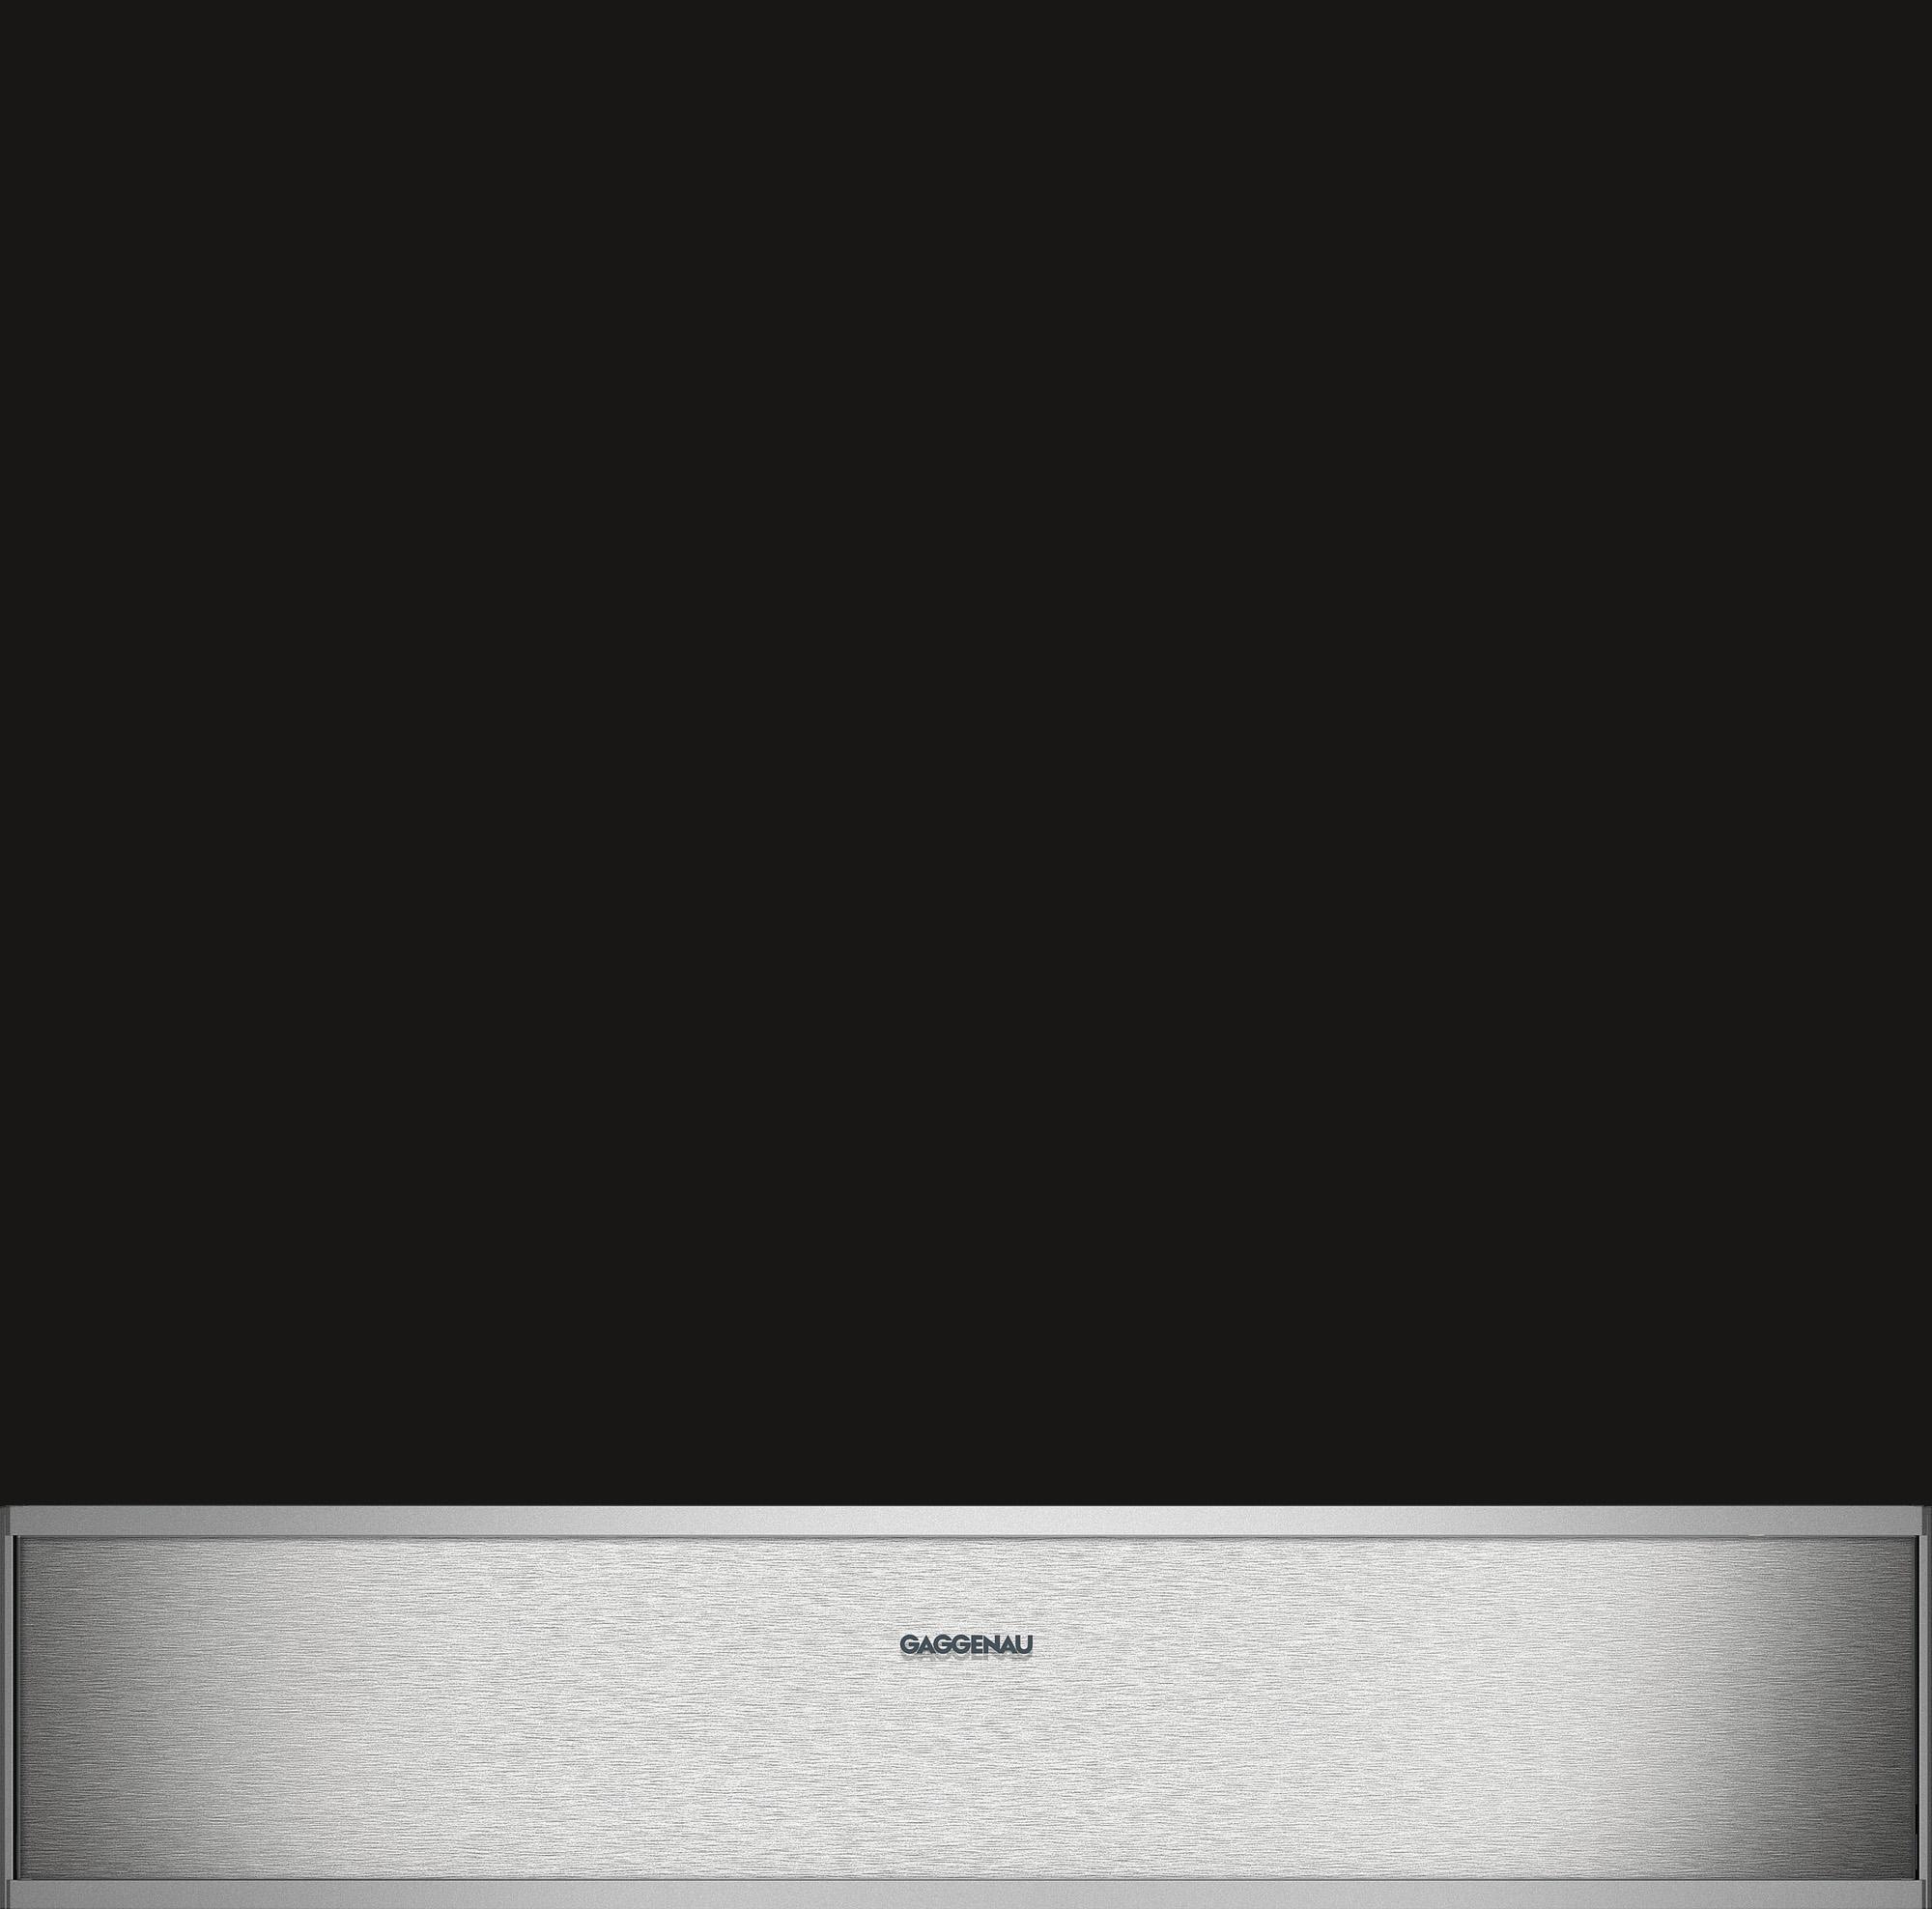 Шафа  для вакуумізаціїї DV461110 GAGGENAU